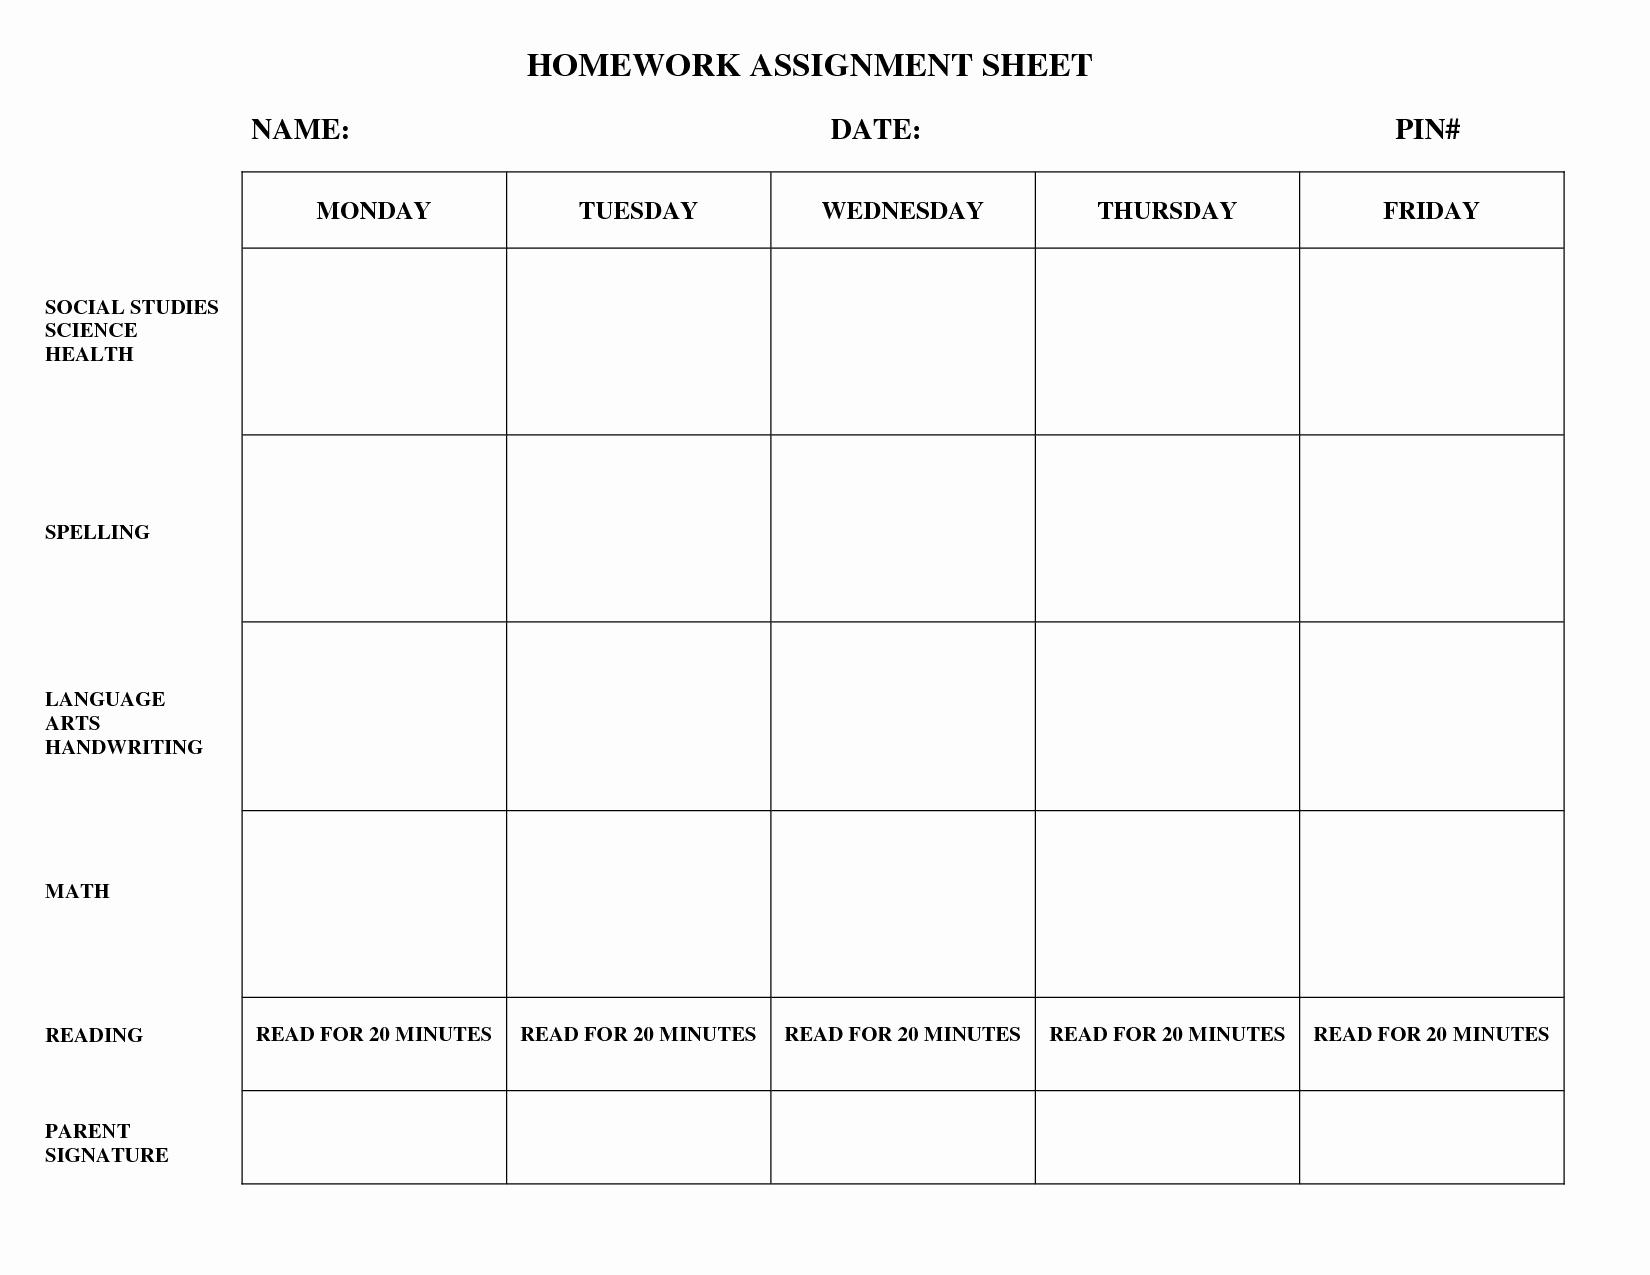 Weekly Homework assignment Sheet Template Lovely 15 Best Of Free Homework Worksheets Printable